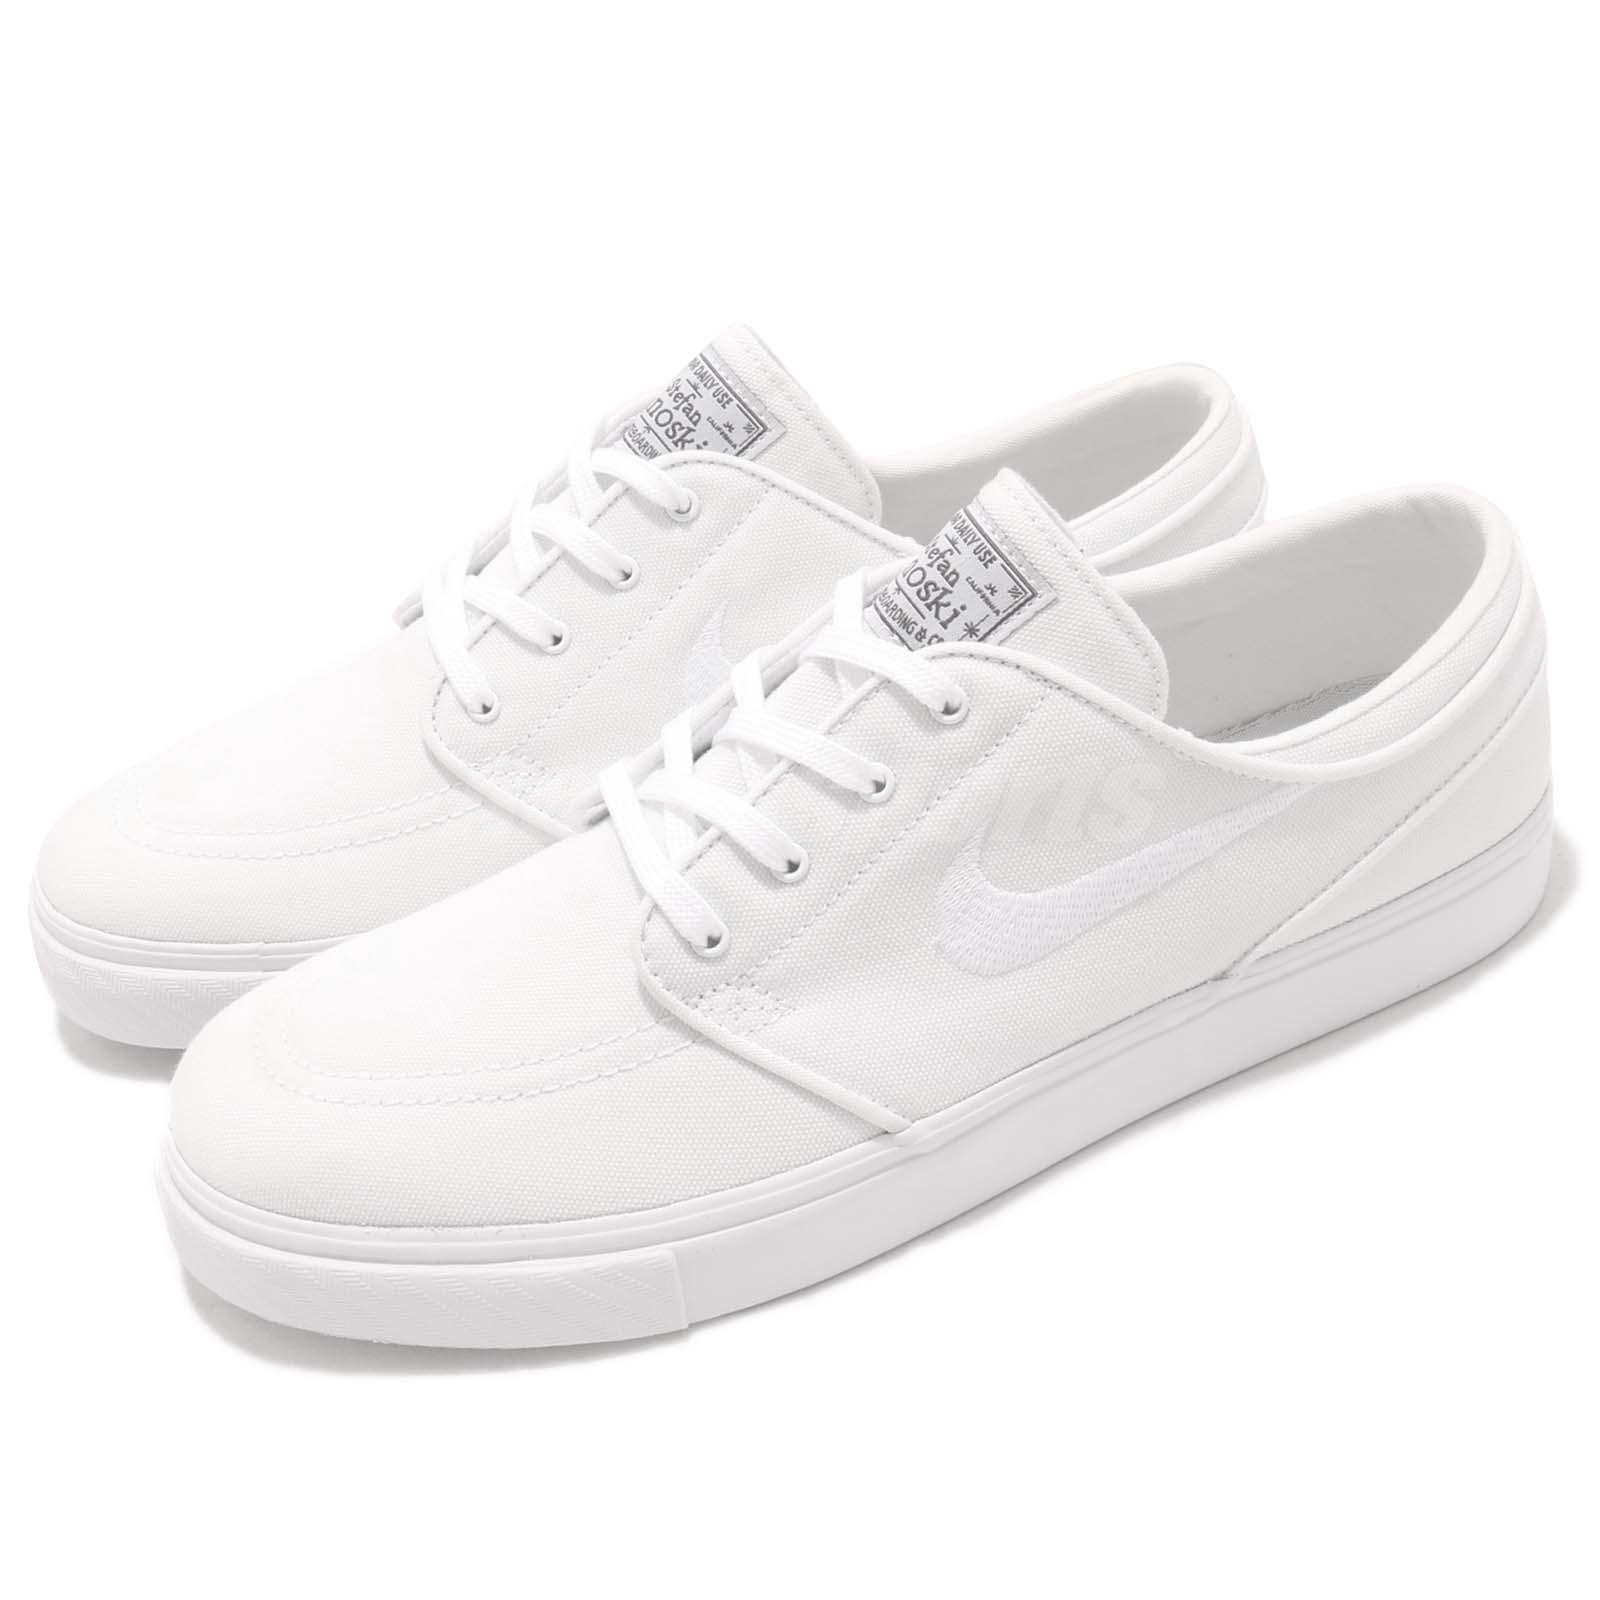 84e1c76780 Details about Nike SB Zoom Stefan Janoski CNVS Canvas White Grey Skateboarding  Shoe 615957-101